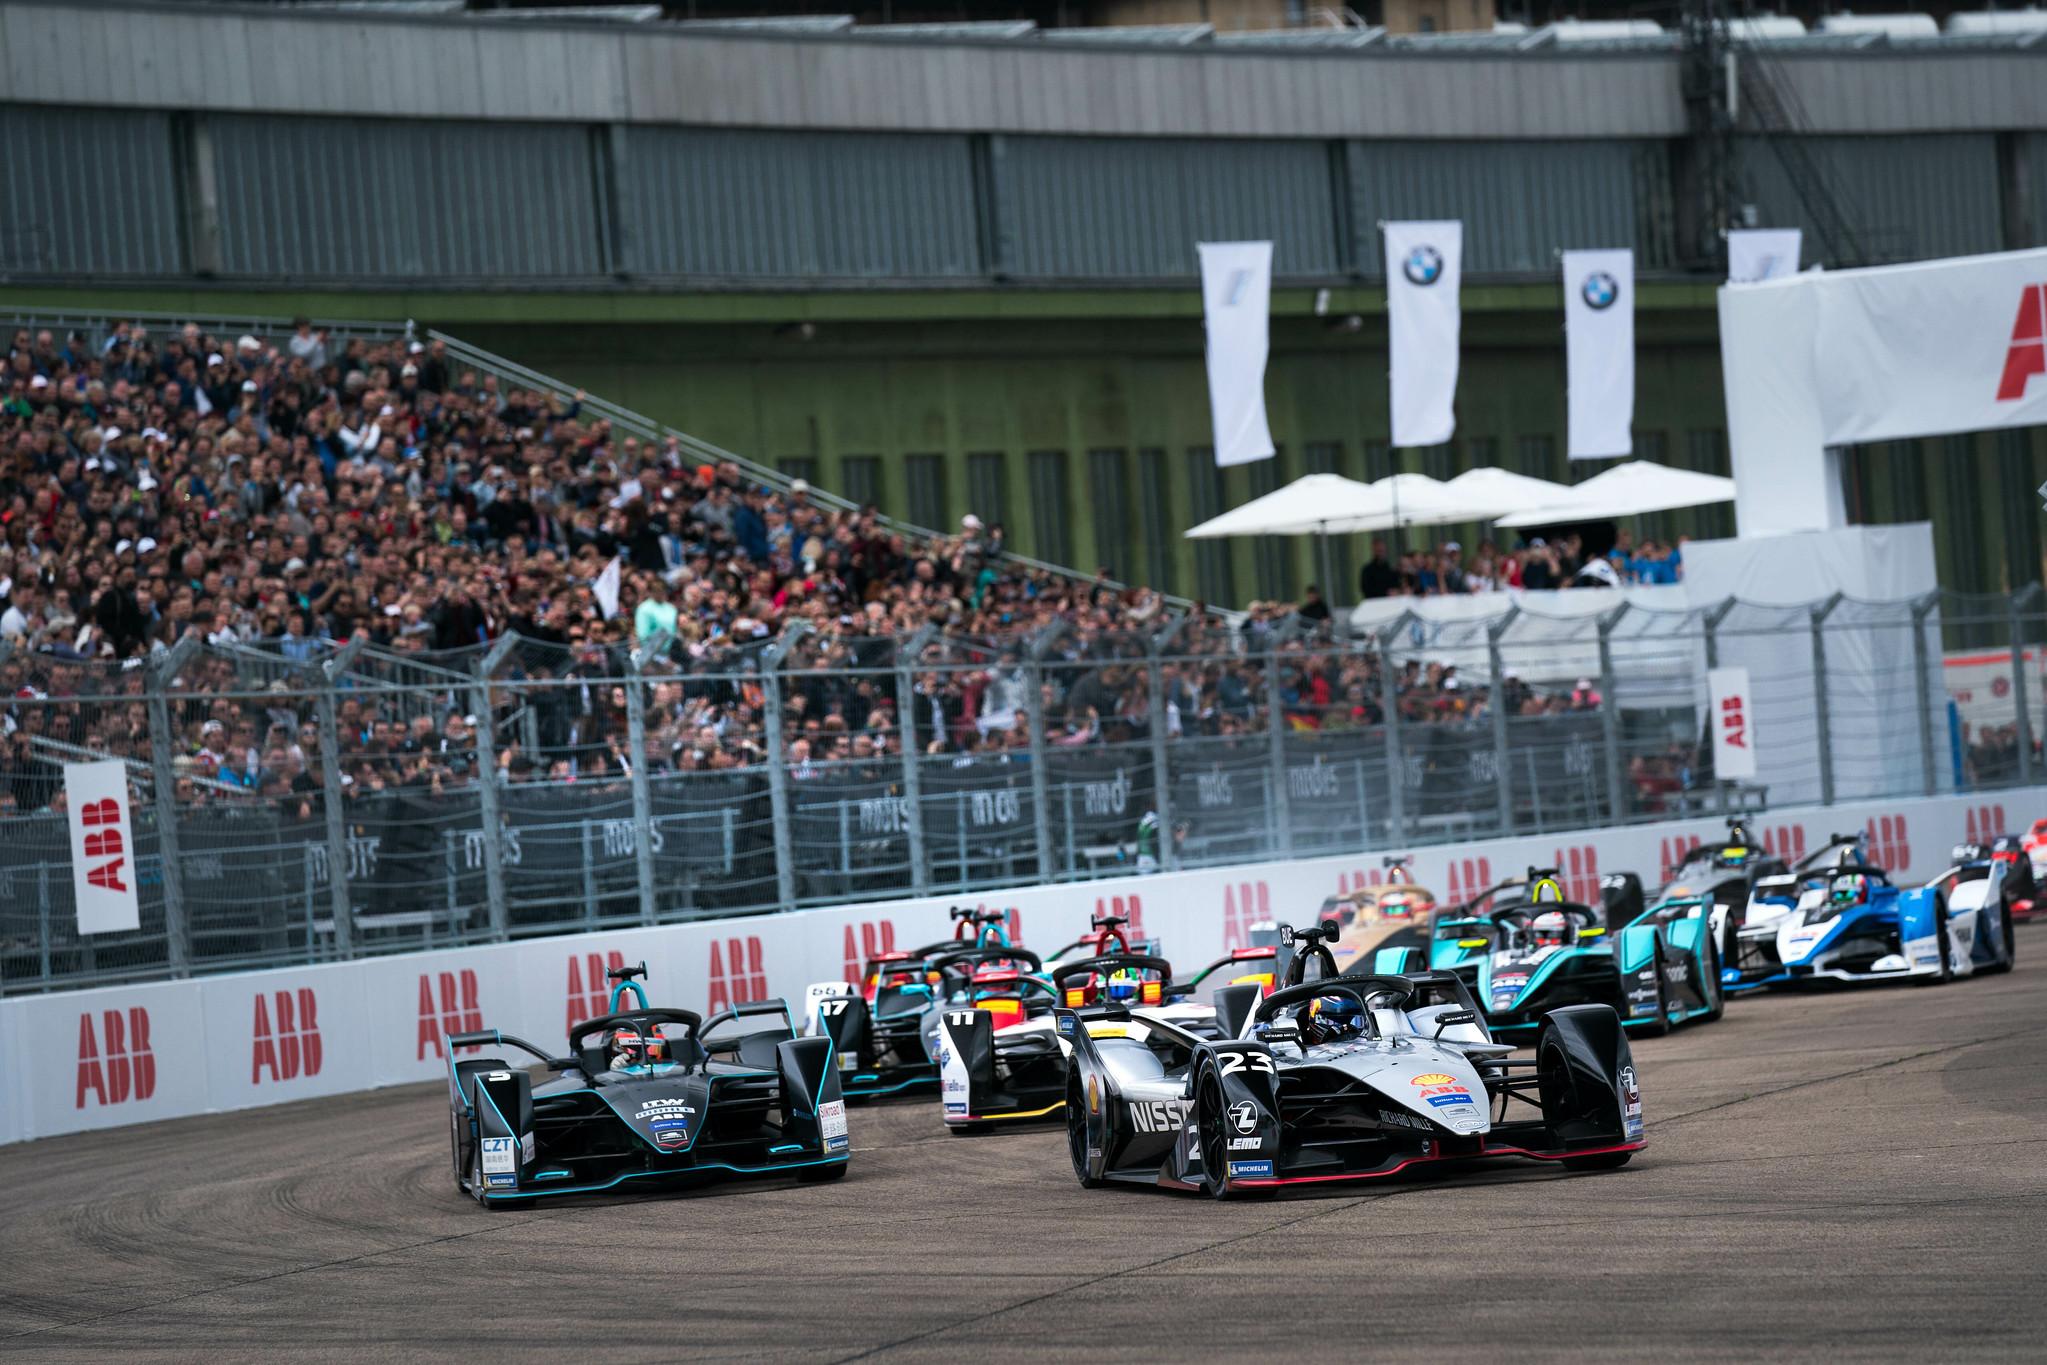 ABB FIA Formula E ja Berliinin E-Prix esittelyssä